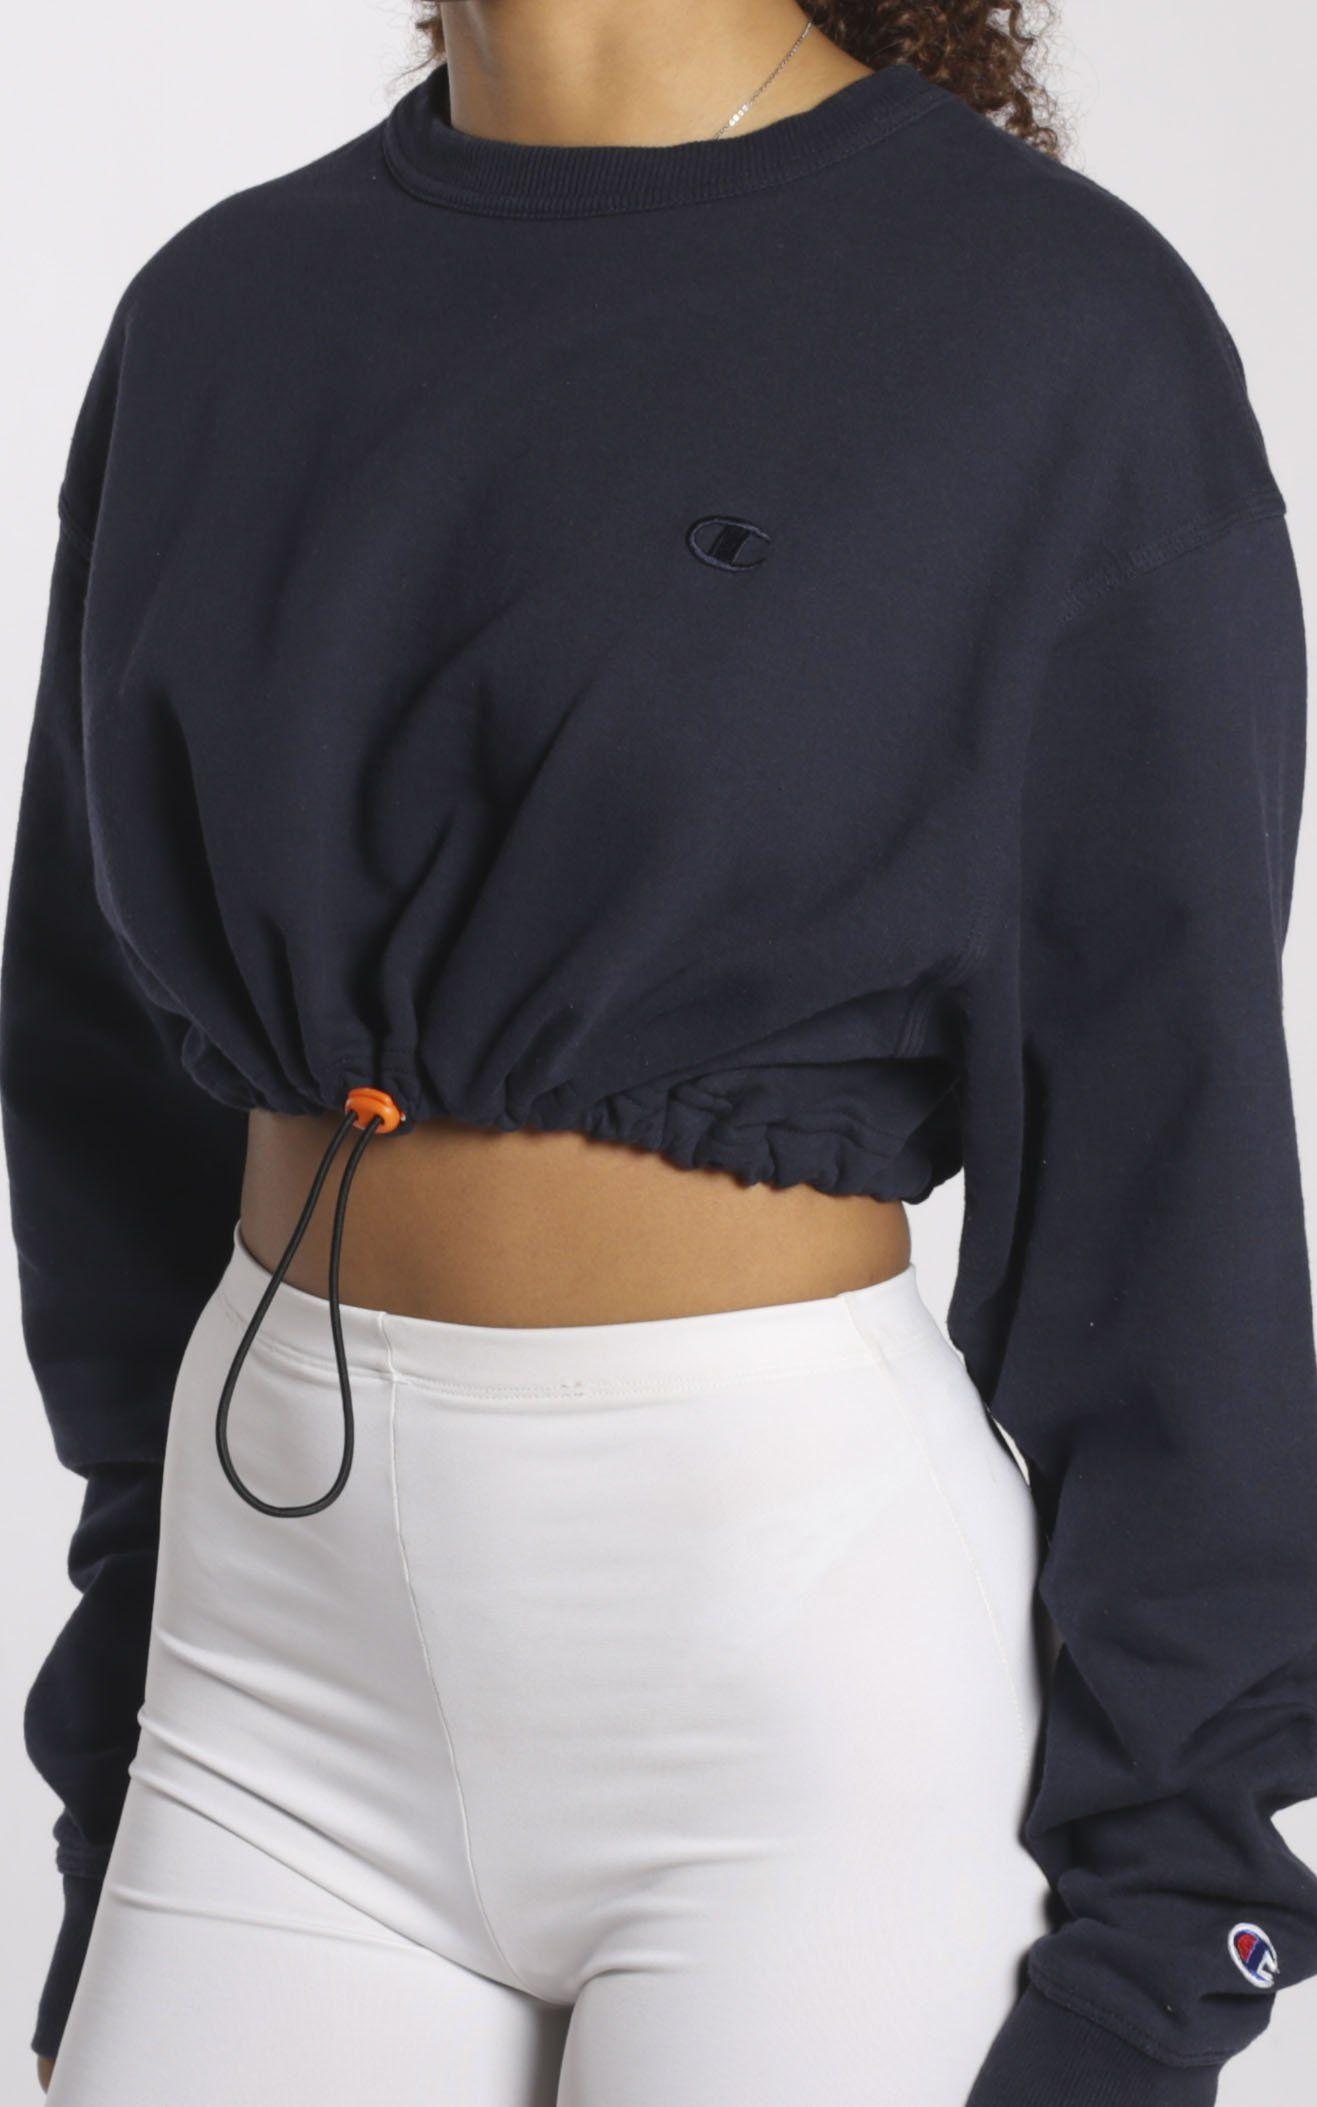 Vintage Rework Champion Cinched Crop Sweatshirt Frankie Collective Crop Sweatshirt Aesthetic Clothes Fashion